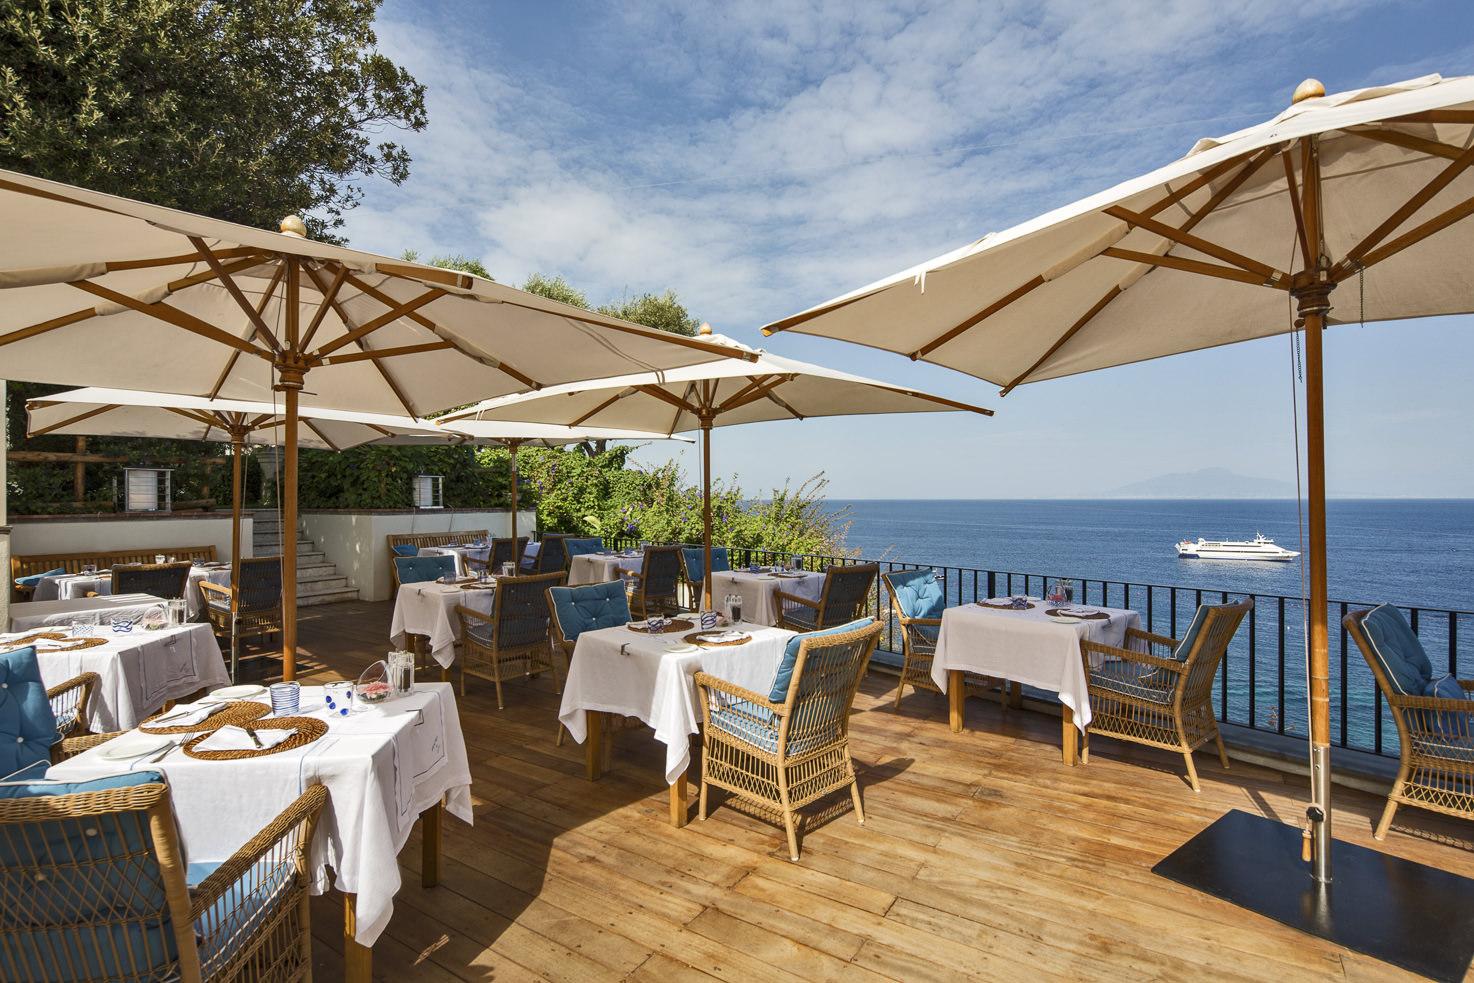 JK Place Hotel Terrace Restaurant